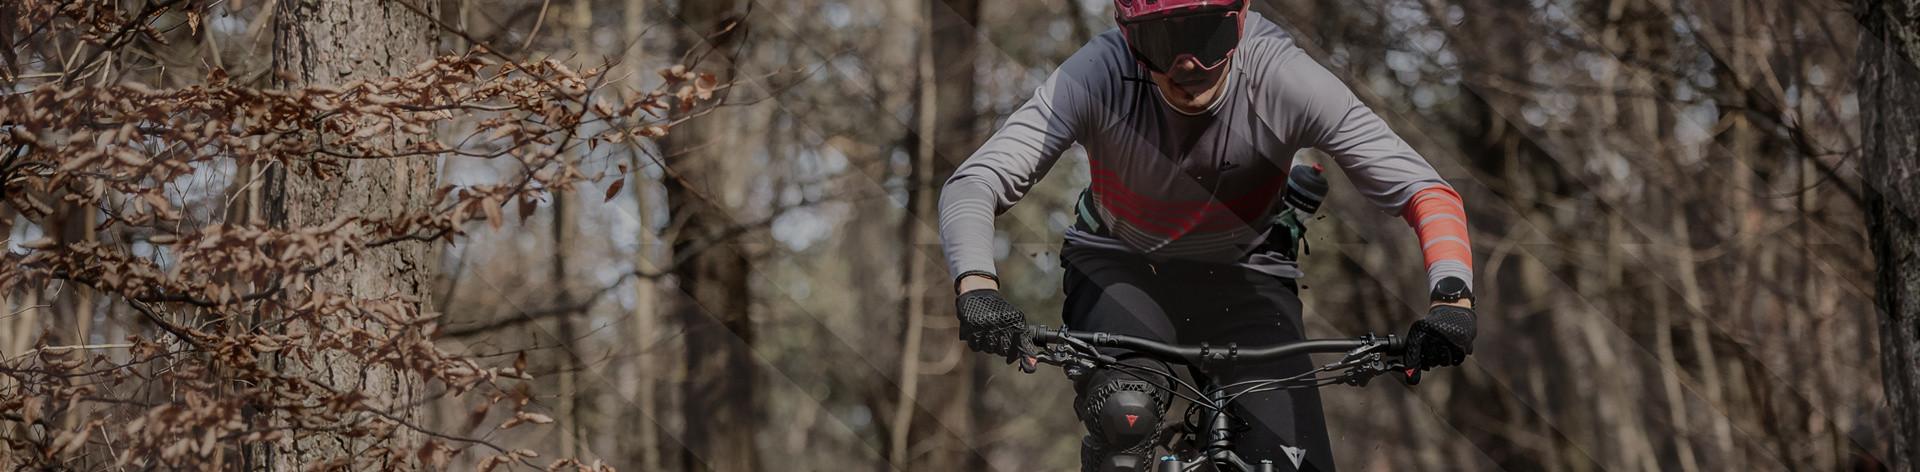 Dainese Winter Sale 2020 - Bike